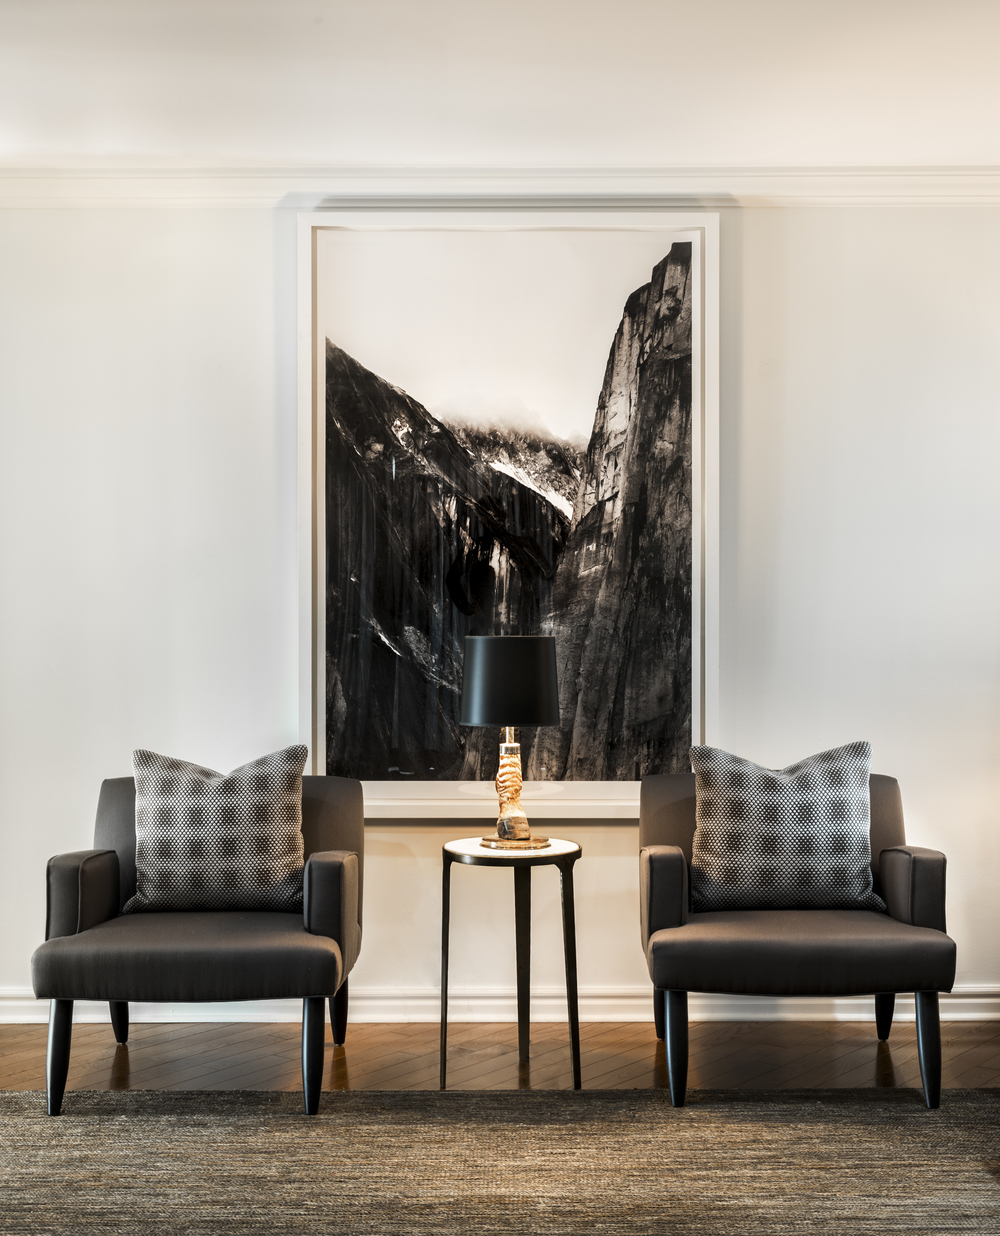 Paula Himmel Design